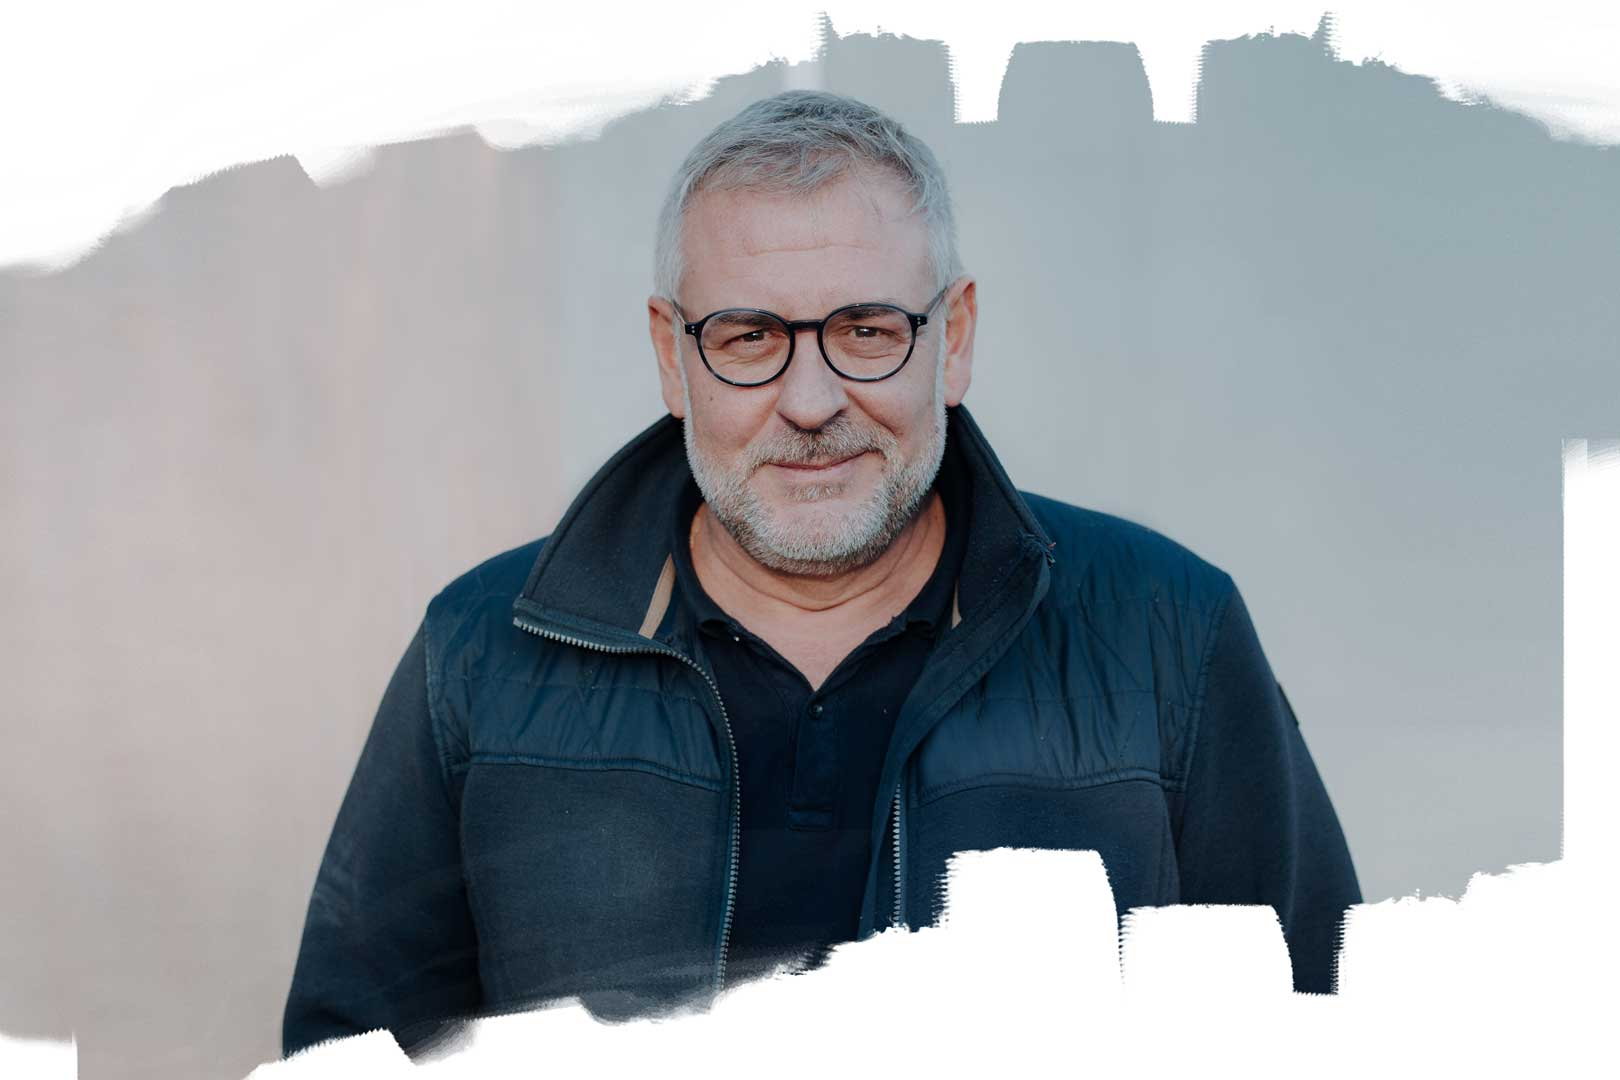 Dirk Raffelsieper Malermeister Wipperfürth